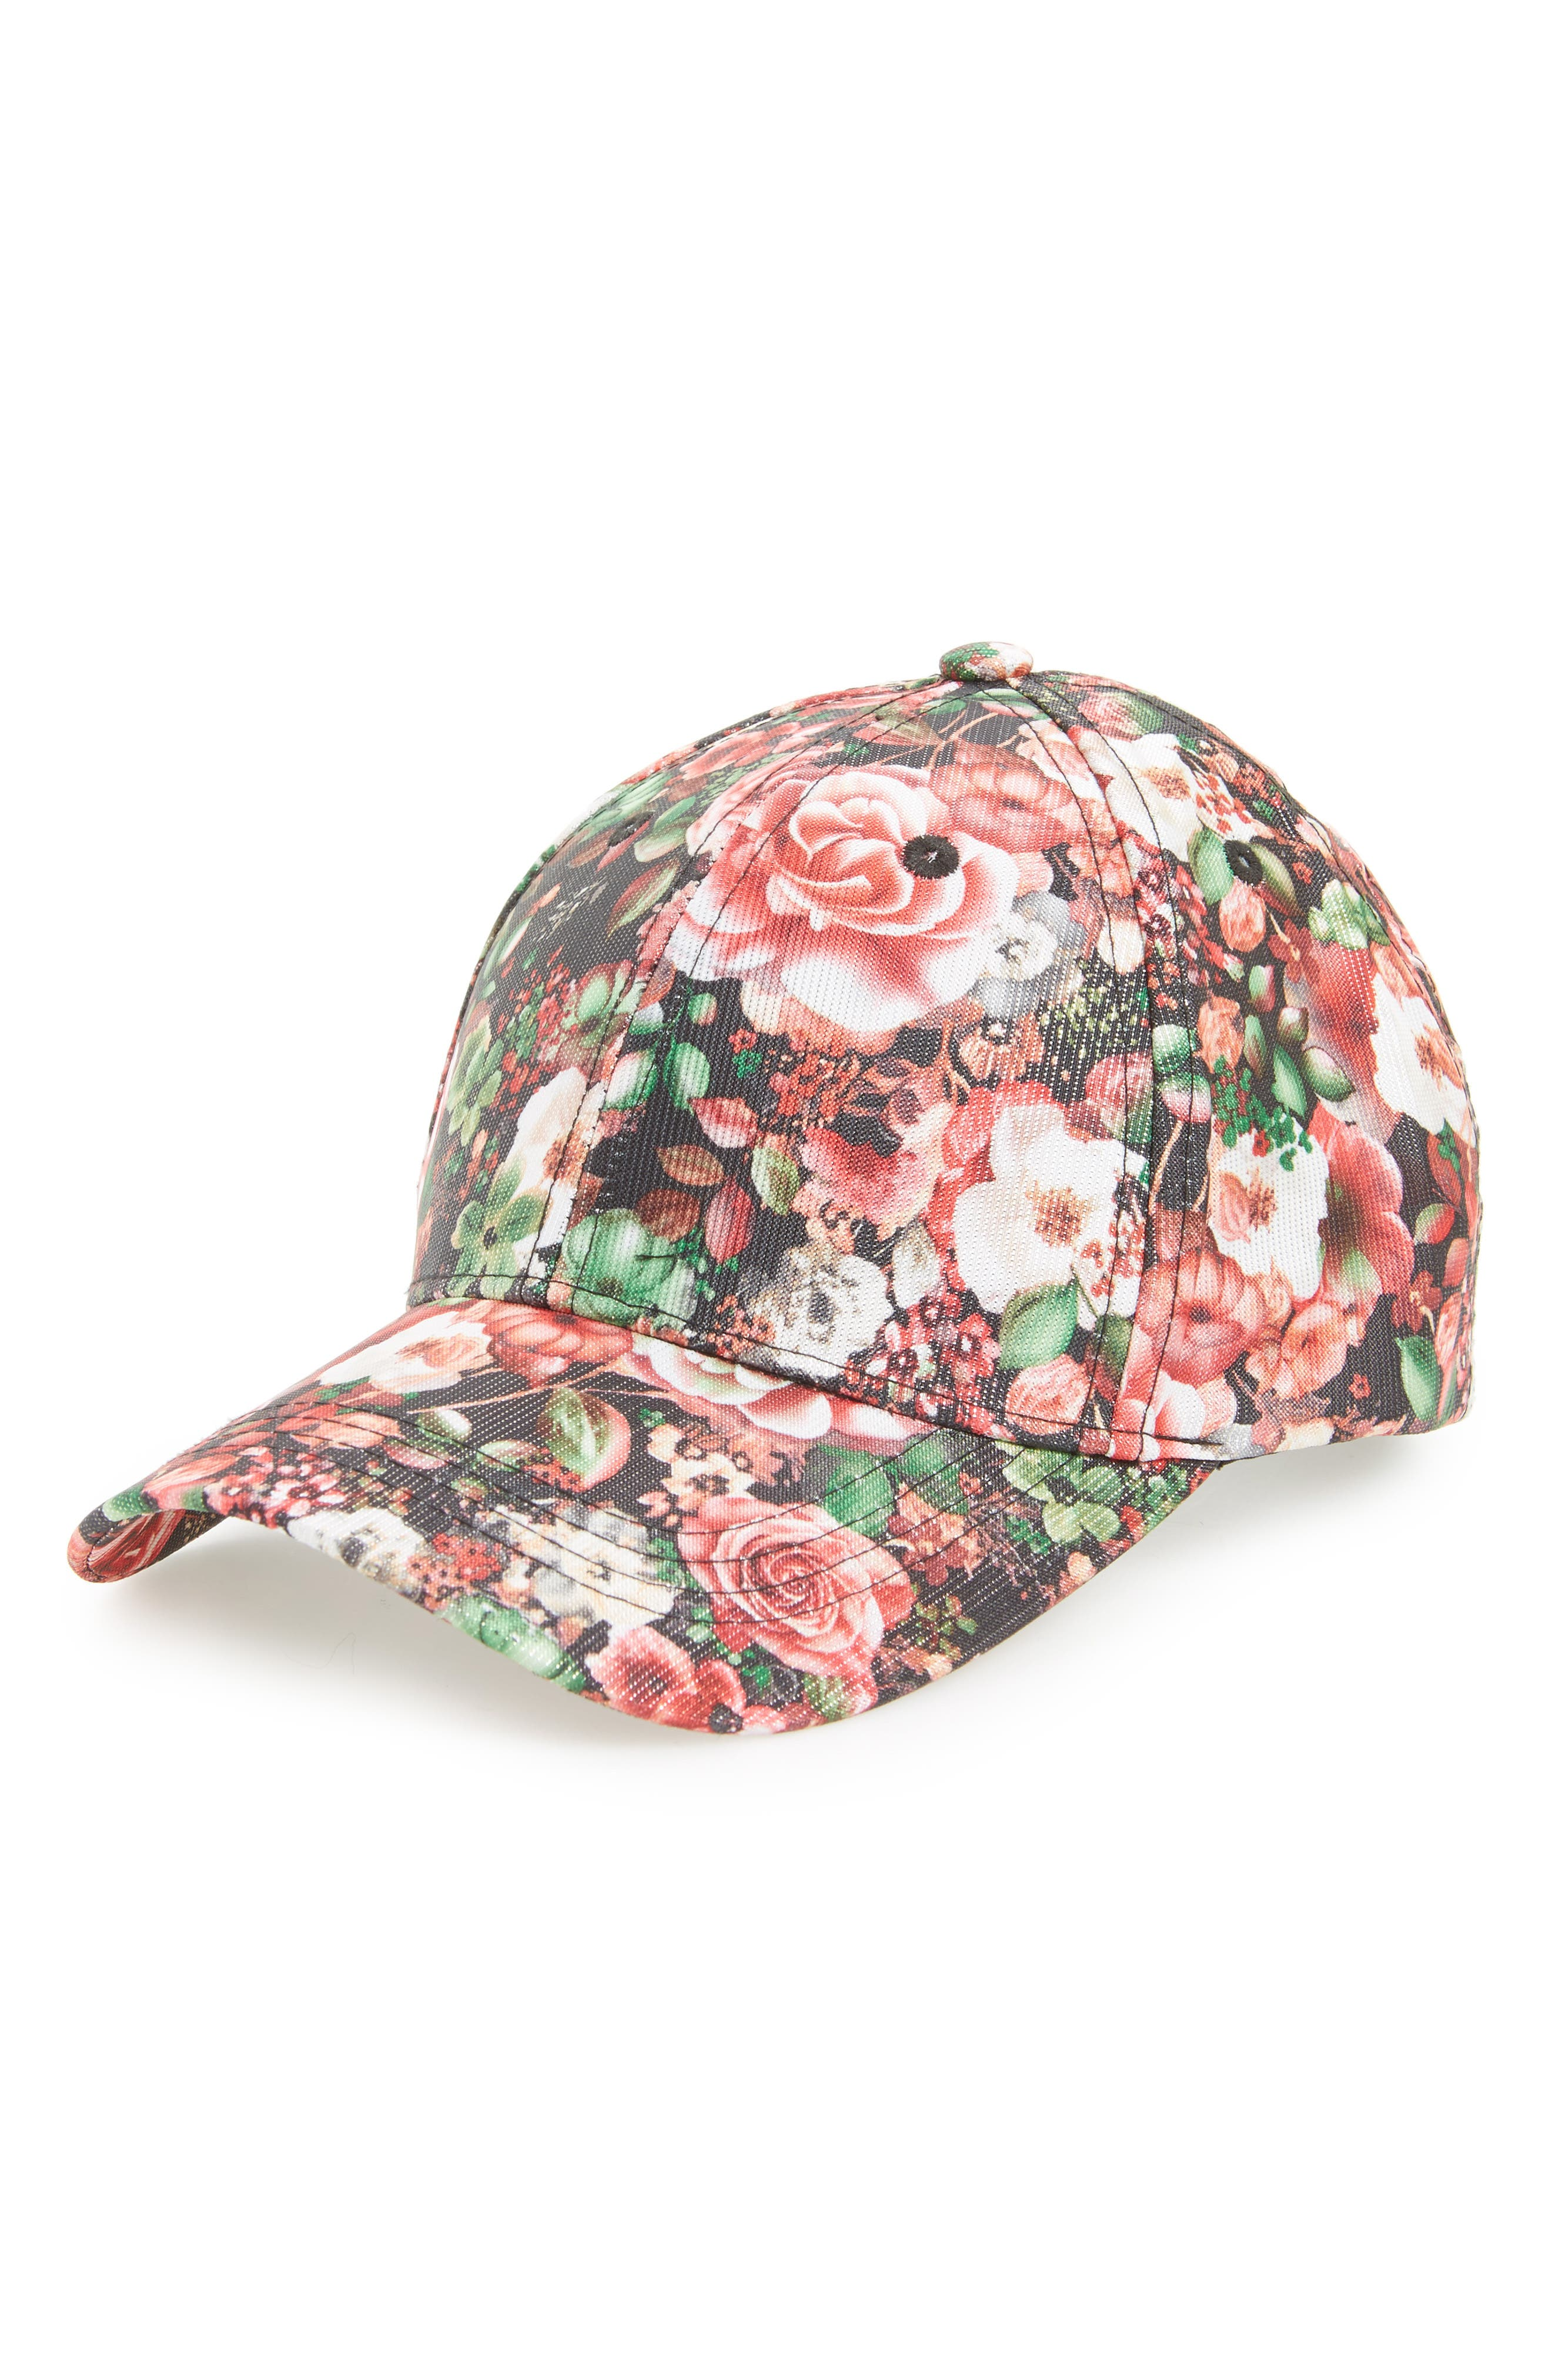 Amici Accessories Rose Floral Print Ball Cap